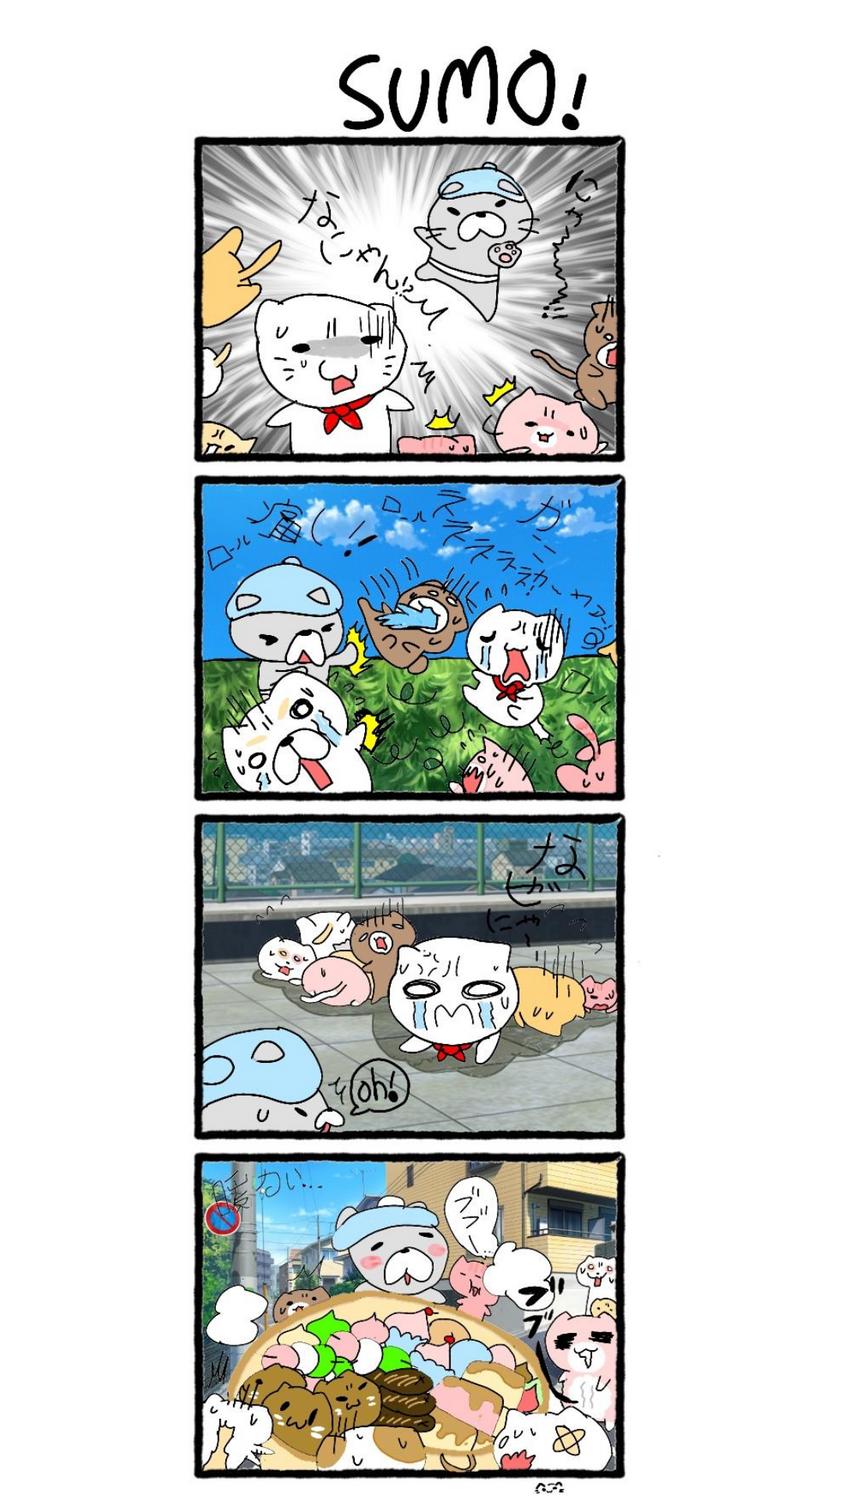 Chibiko Neko Comics Volume 1 Episode 1 SUMO! ちびっこねこ WEB